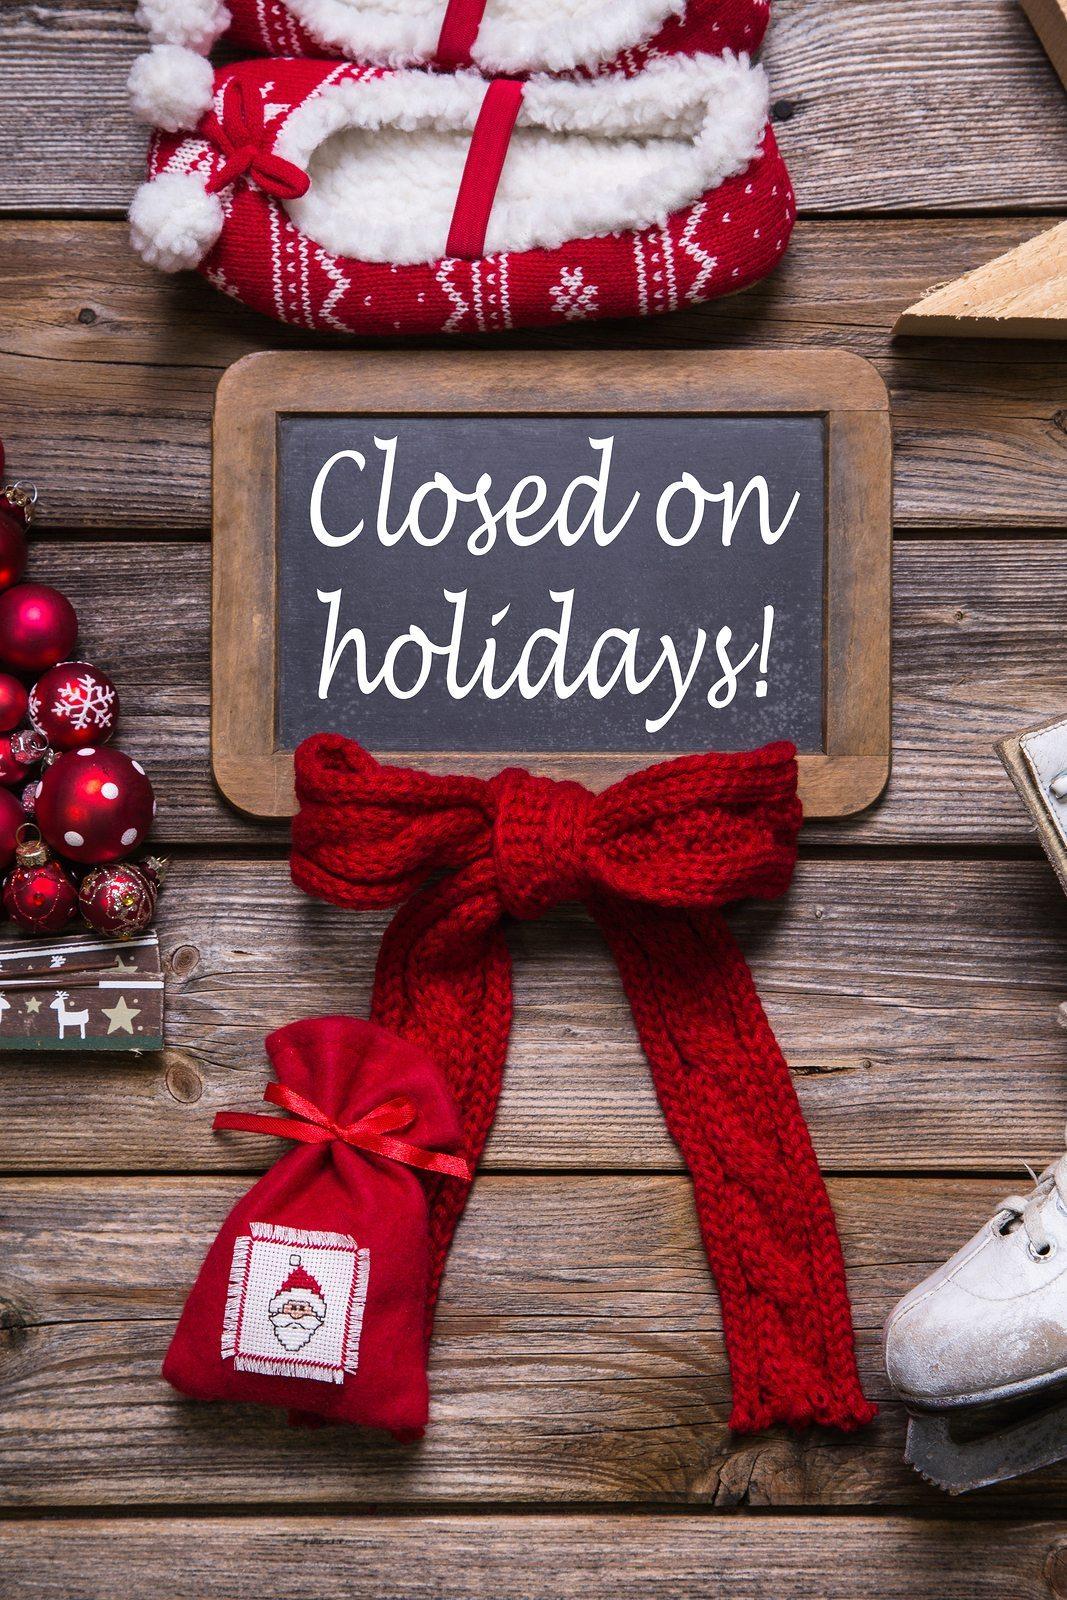 Annual Christmas Shutdown